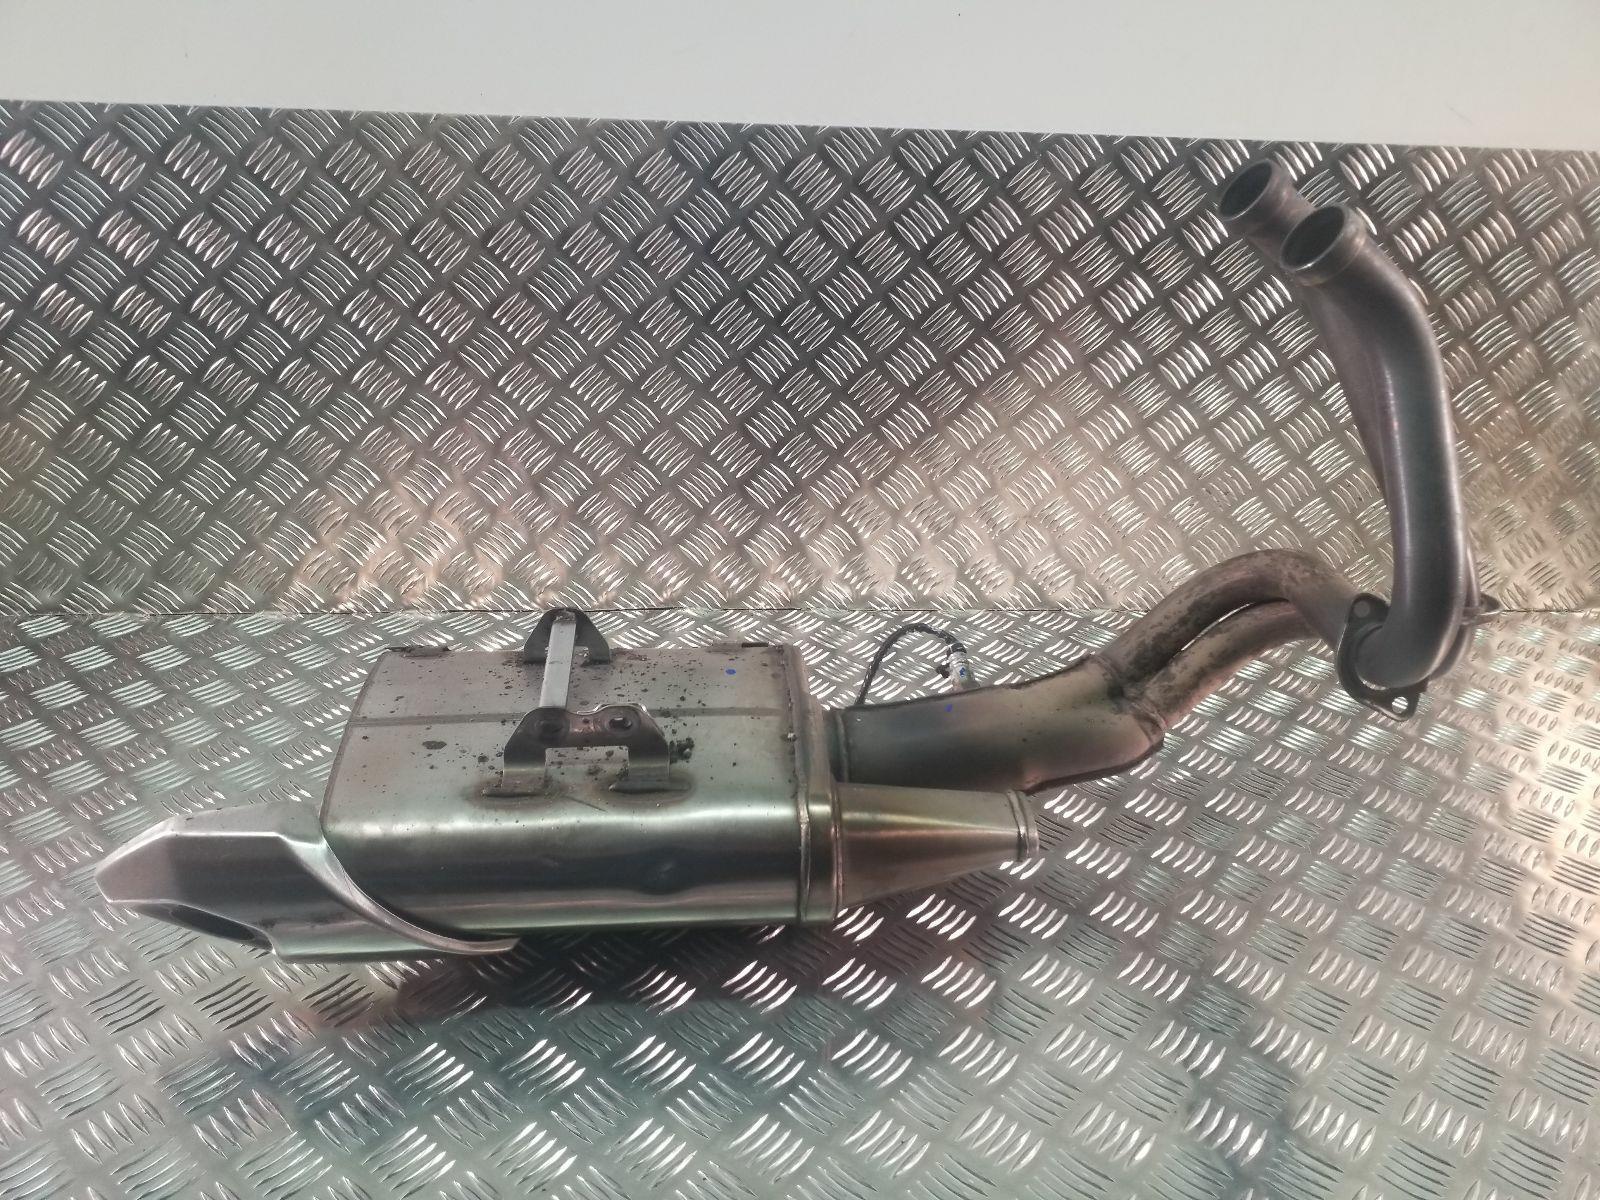 2012 Kawasaki 650 ECF Exhaust System